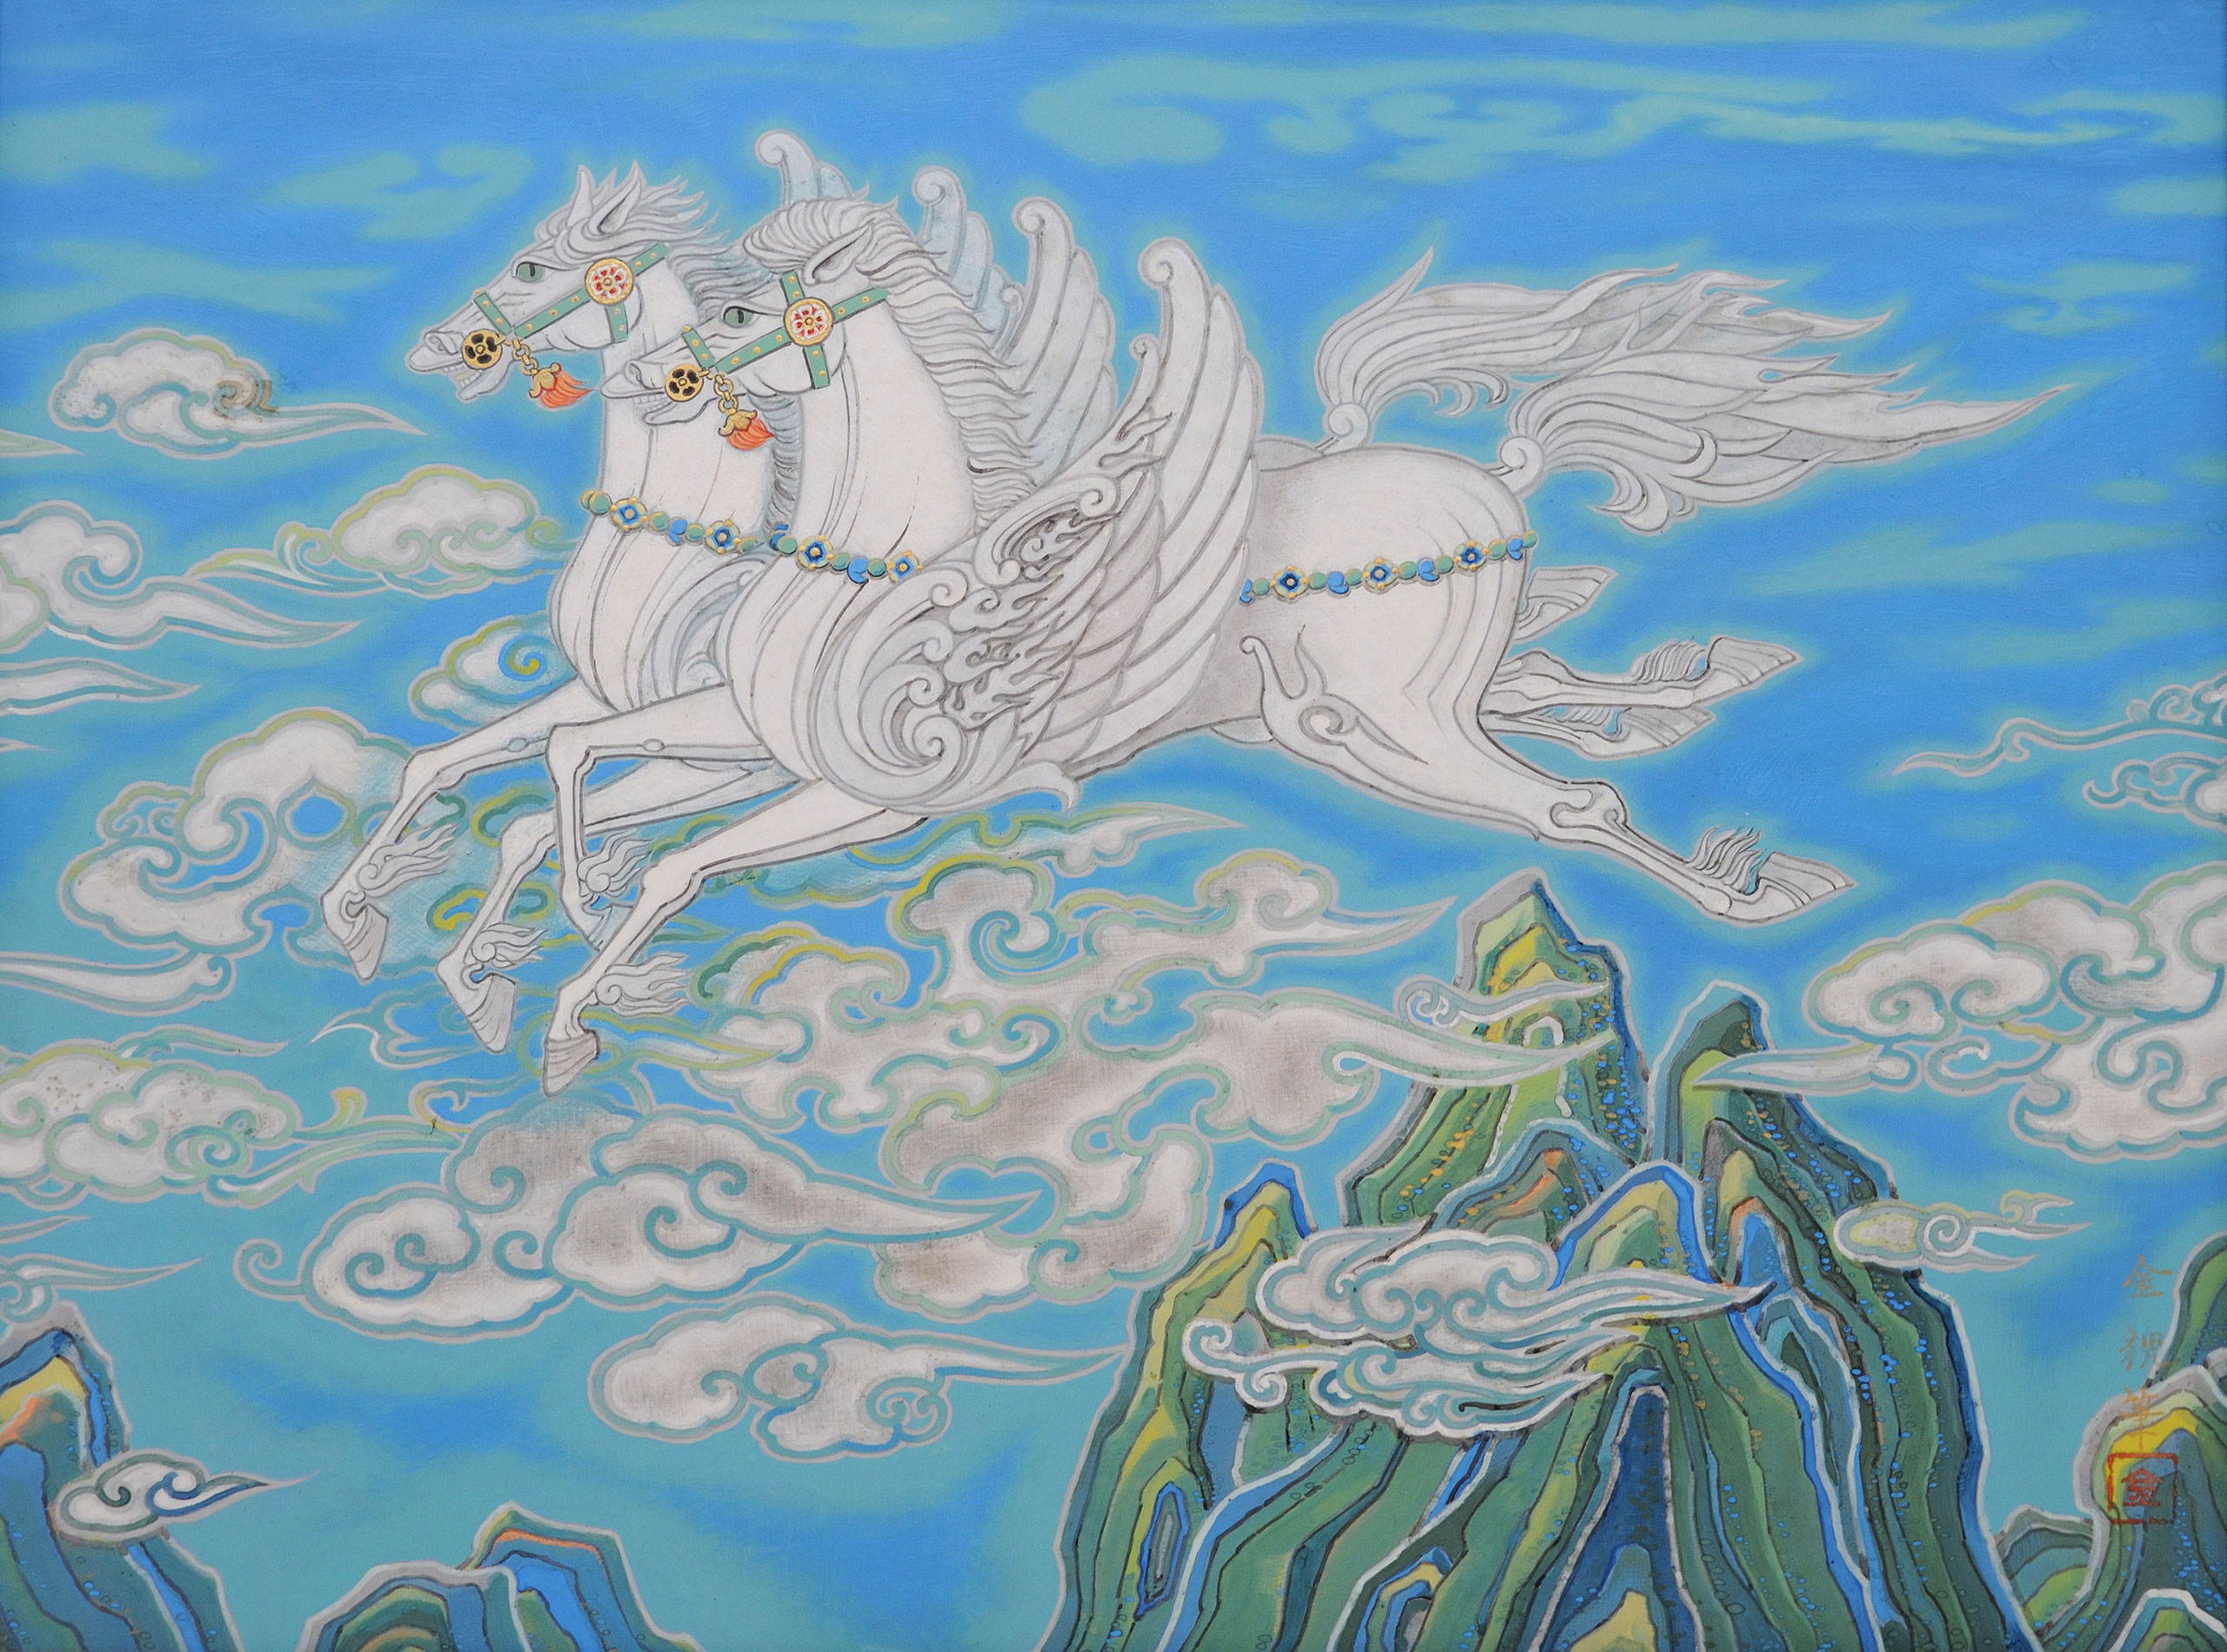 天馬図 - Pegasus